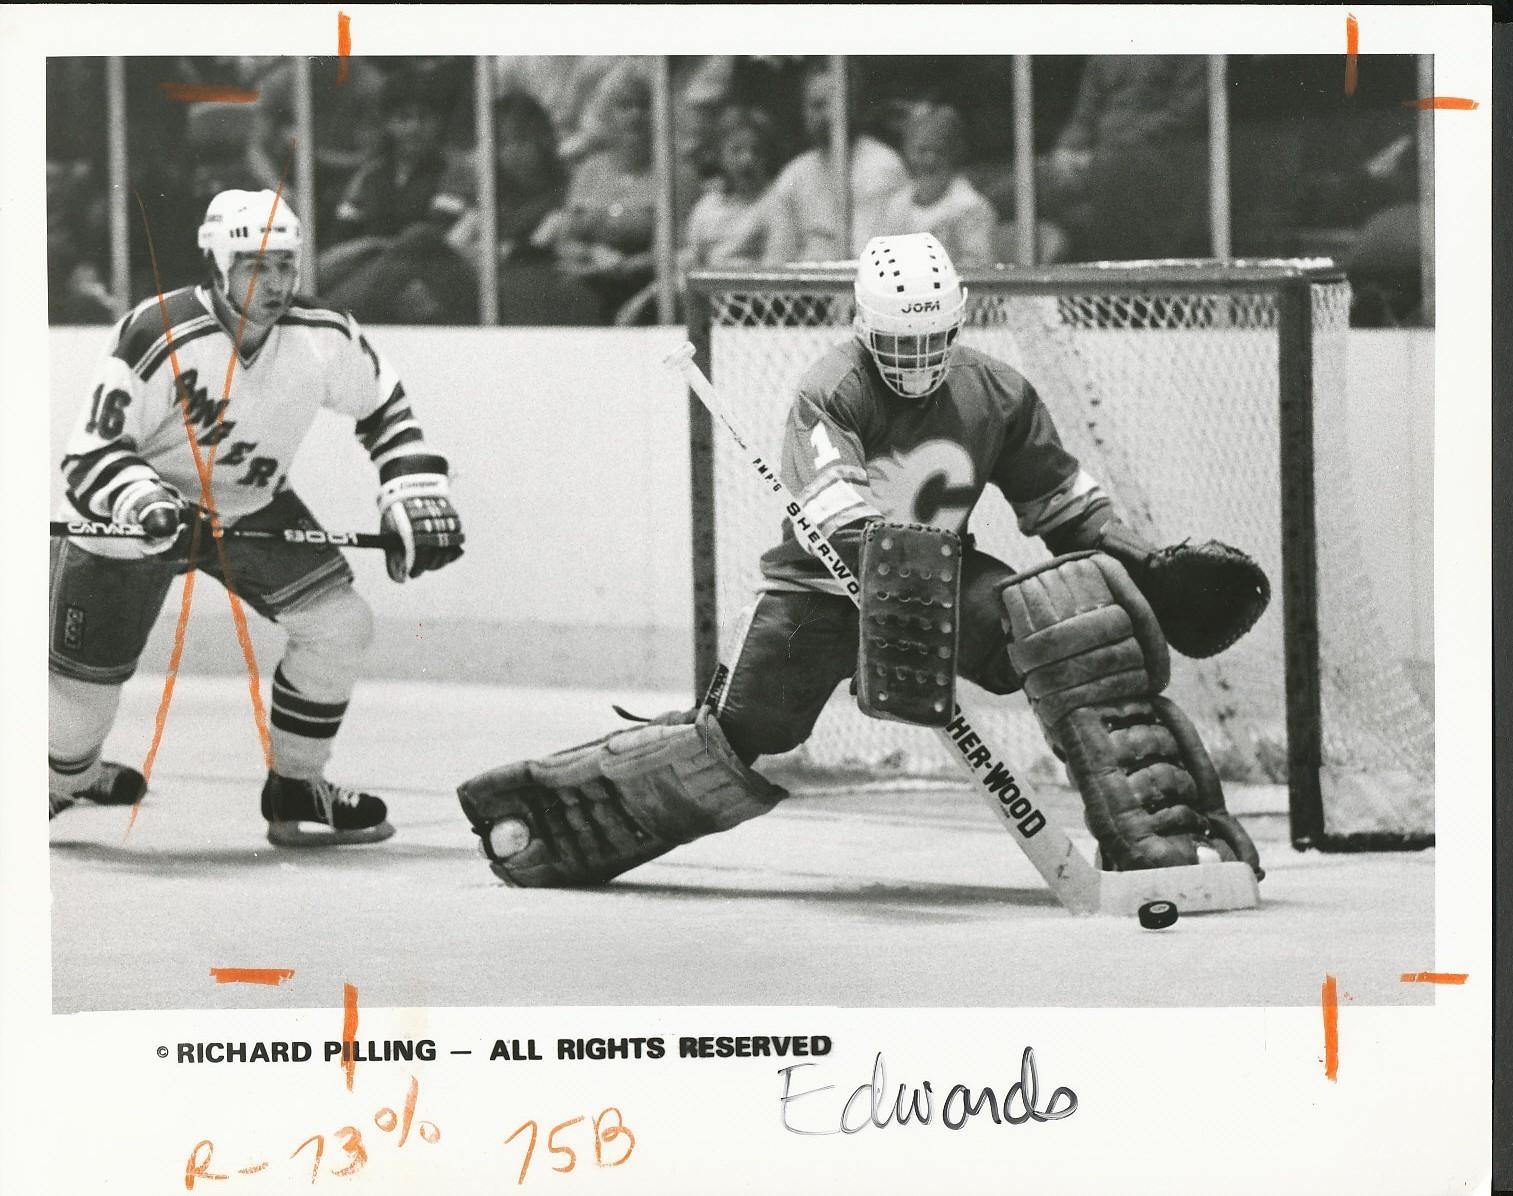 1983 Edwards.JPG